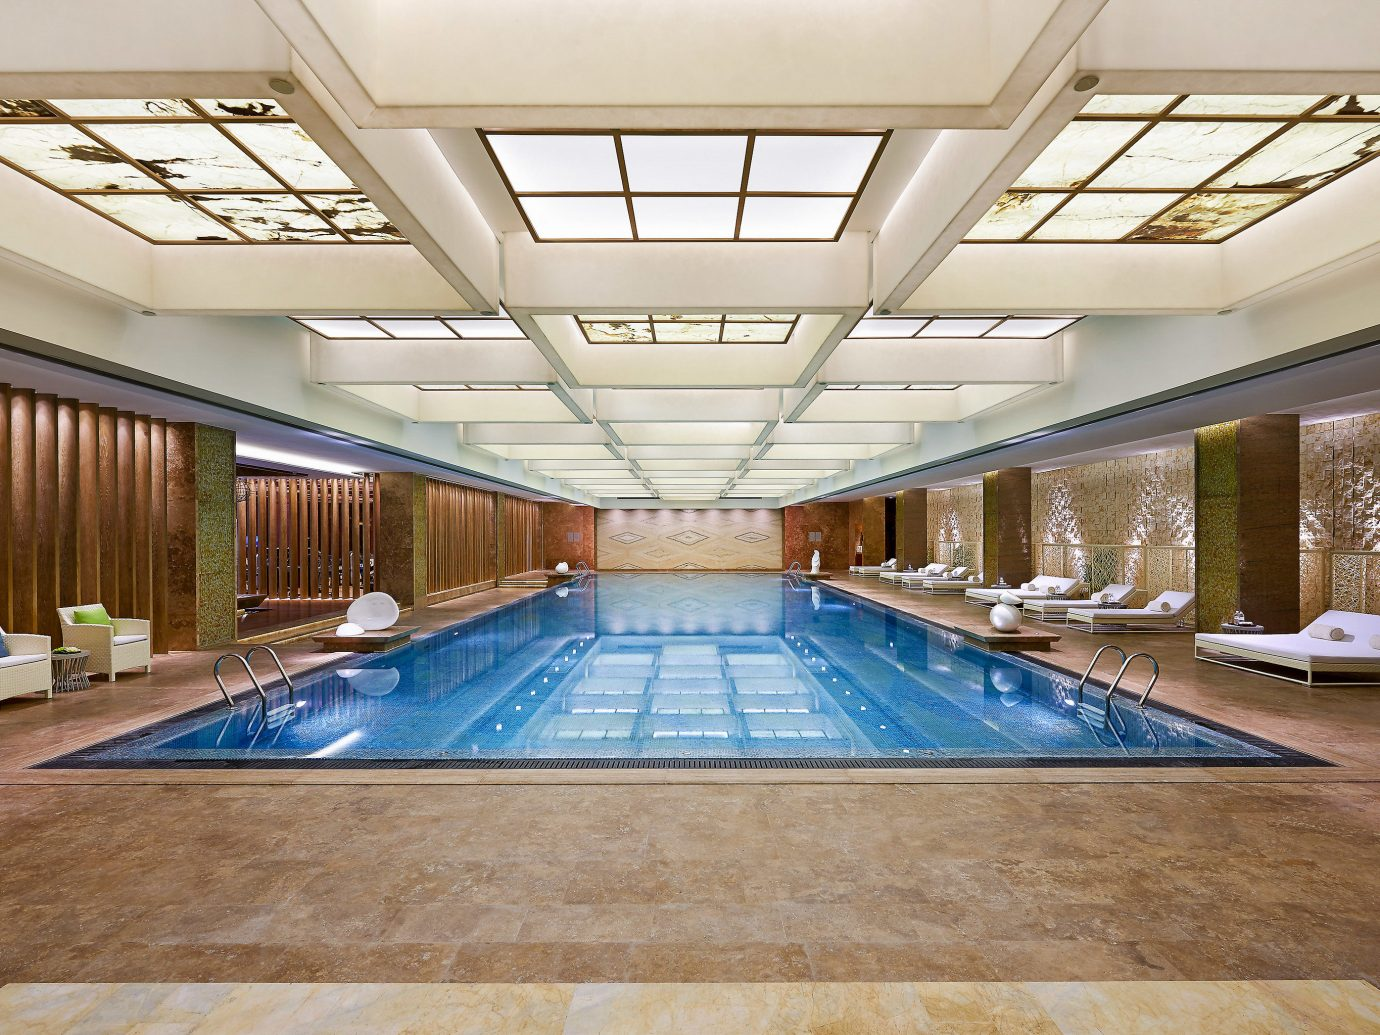 Boutique Hotels Luxury Travel indoor ceiling floor swimming pool leisure centre leisure daylighting Lobby real estate estate interior design apartment hotel amenity flooring condominium roof